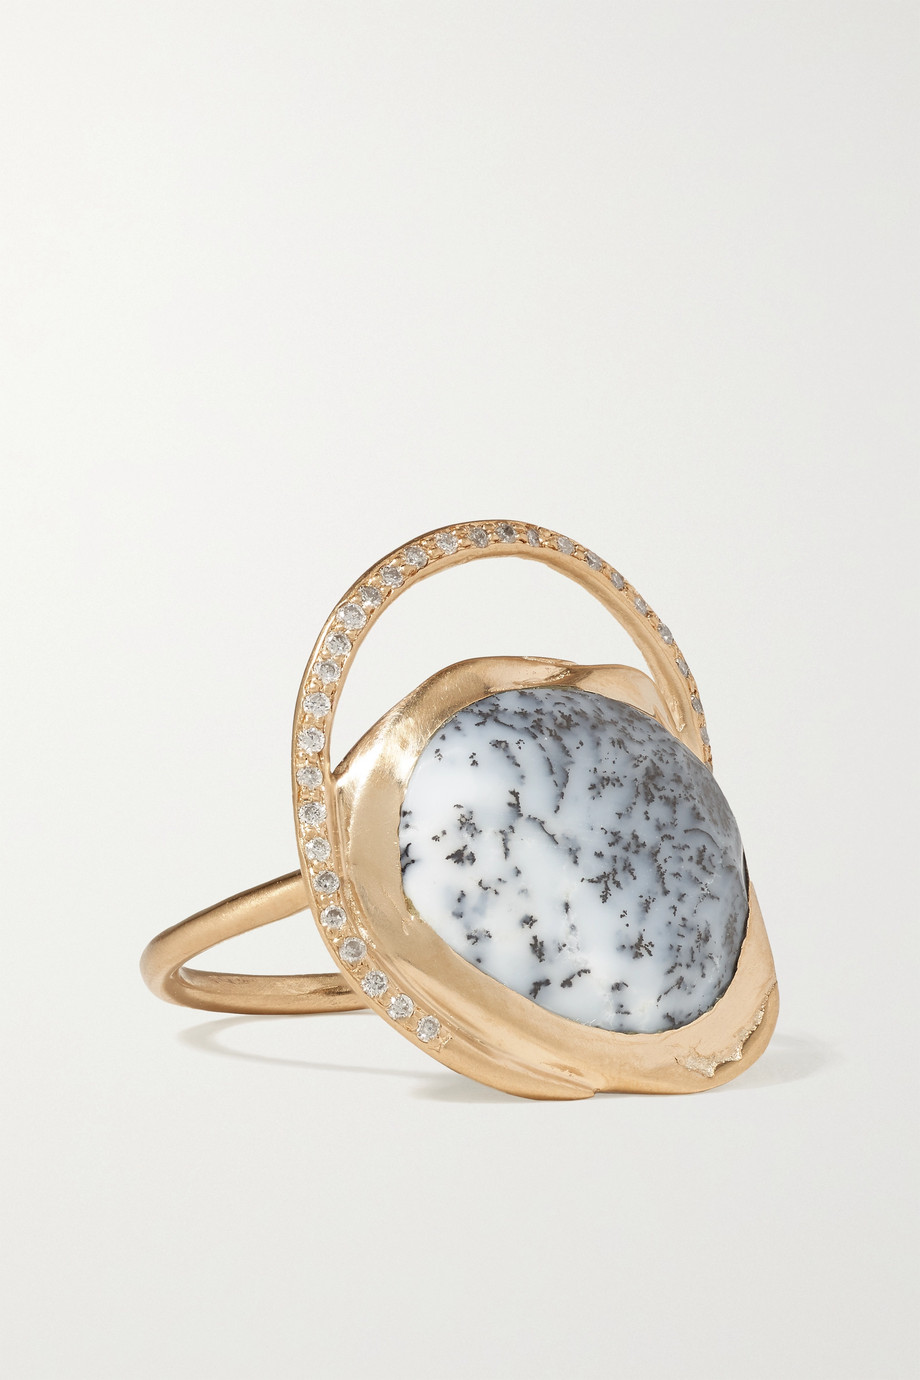 Pascale Monvoisin Gaia 9-karat gold, agate and diamond ring